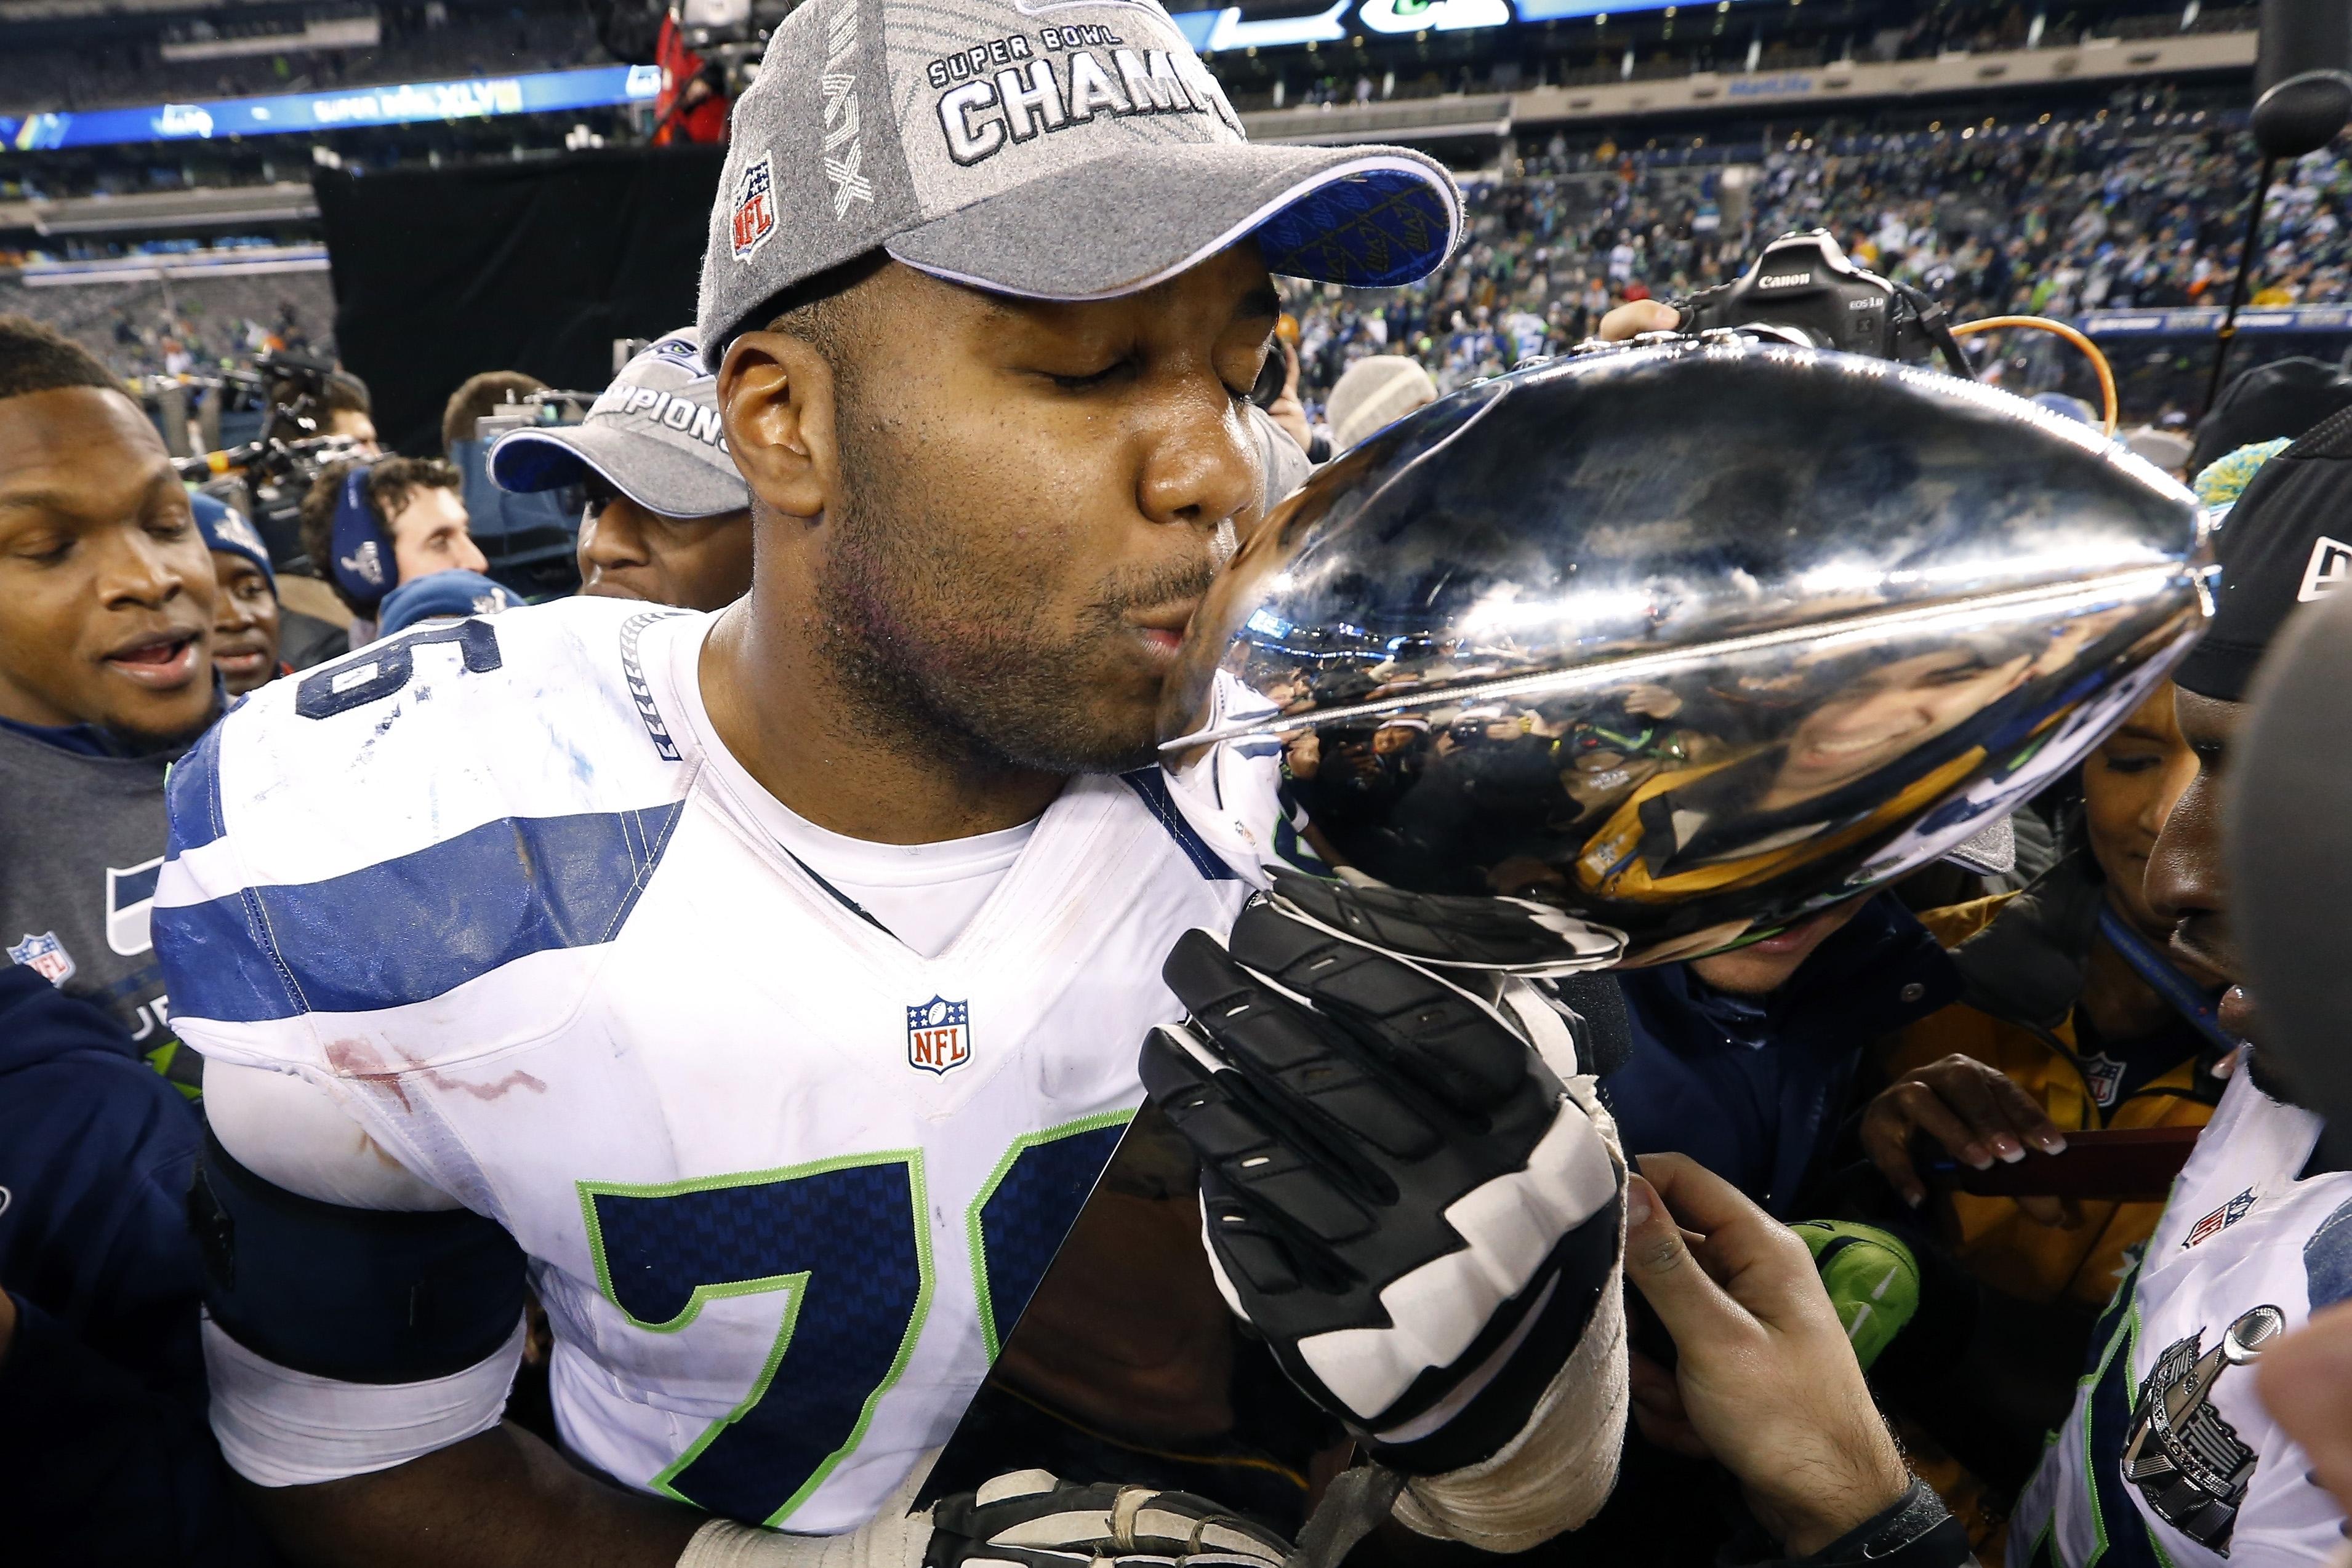 Super Bowl 2014: Seattle Trounces Denver, 43-8 - Cbs News with regard to Seahawks Super Bowl 2014